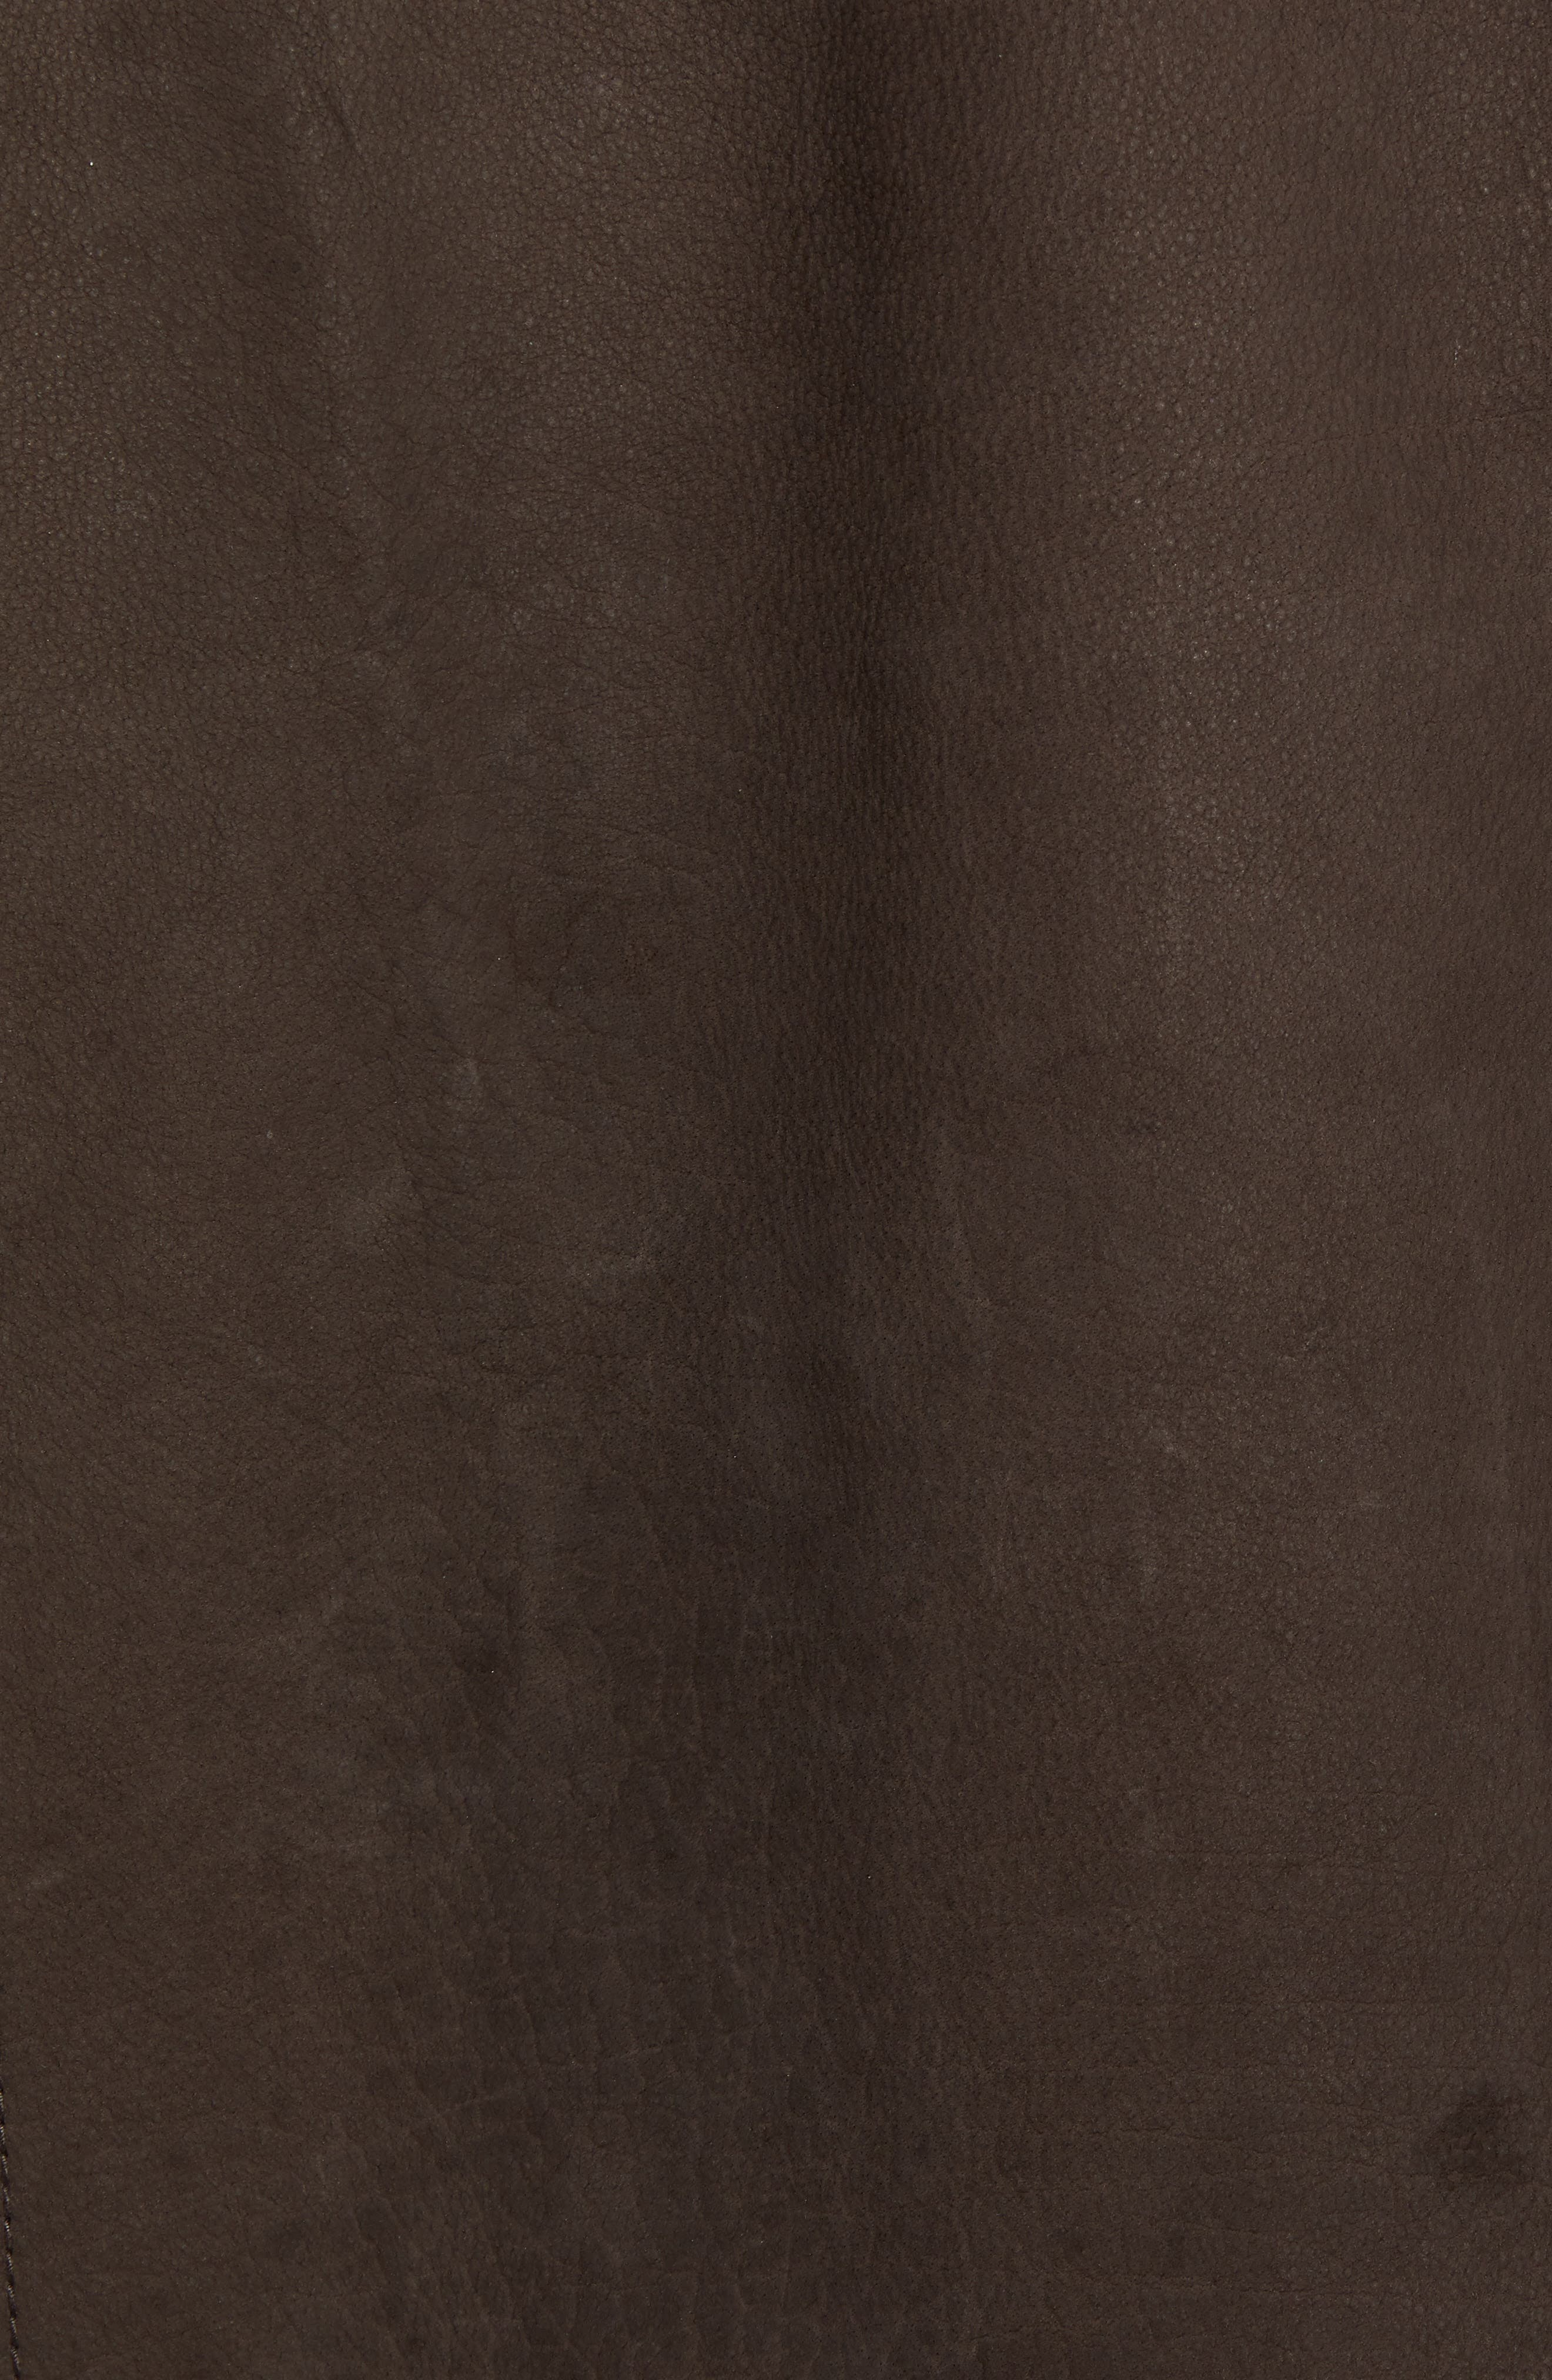 Elliott Bay Leather Jacket,                             Alternate thumbnail 6, color,                             COFFEE